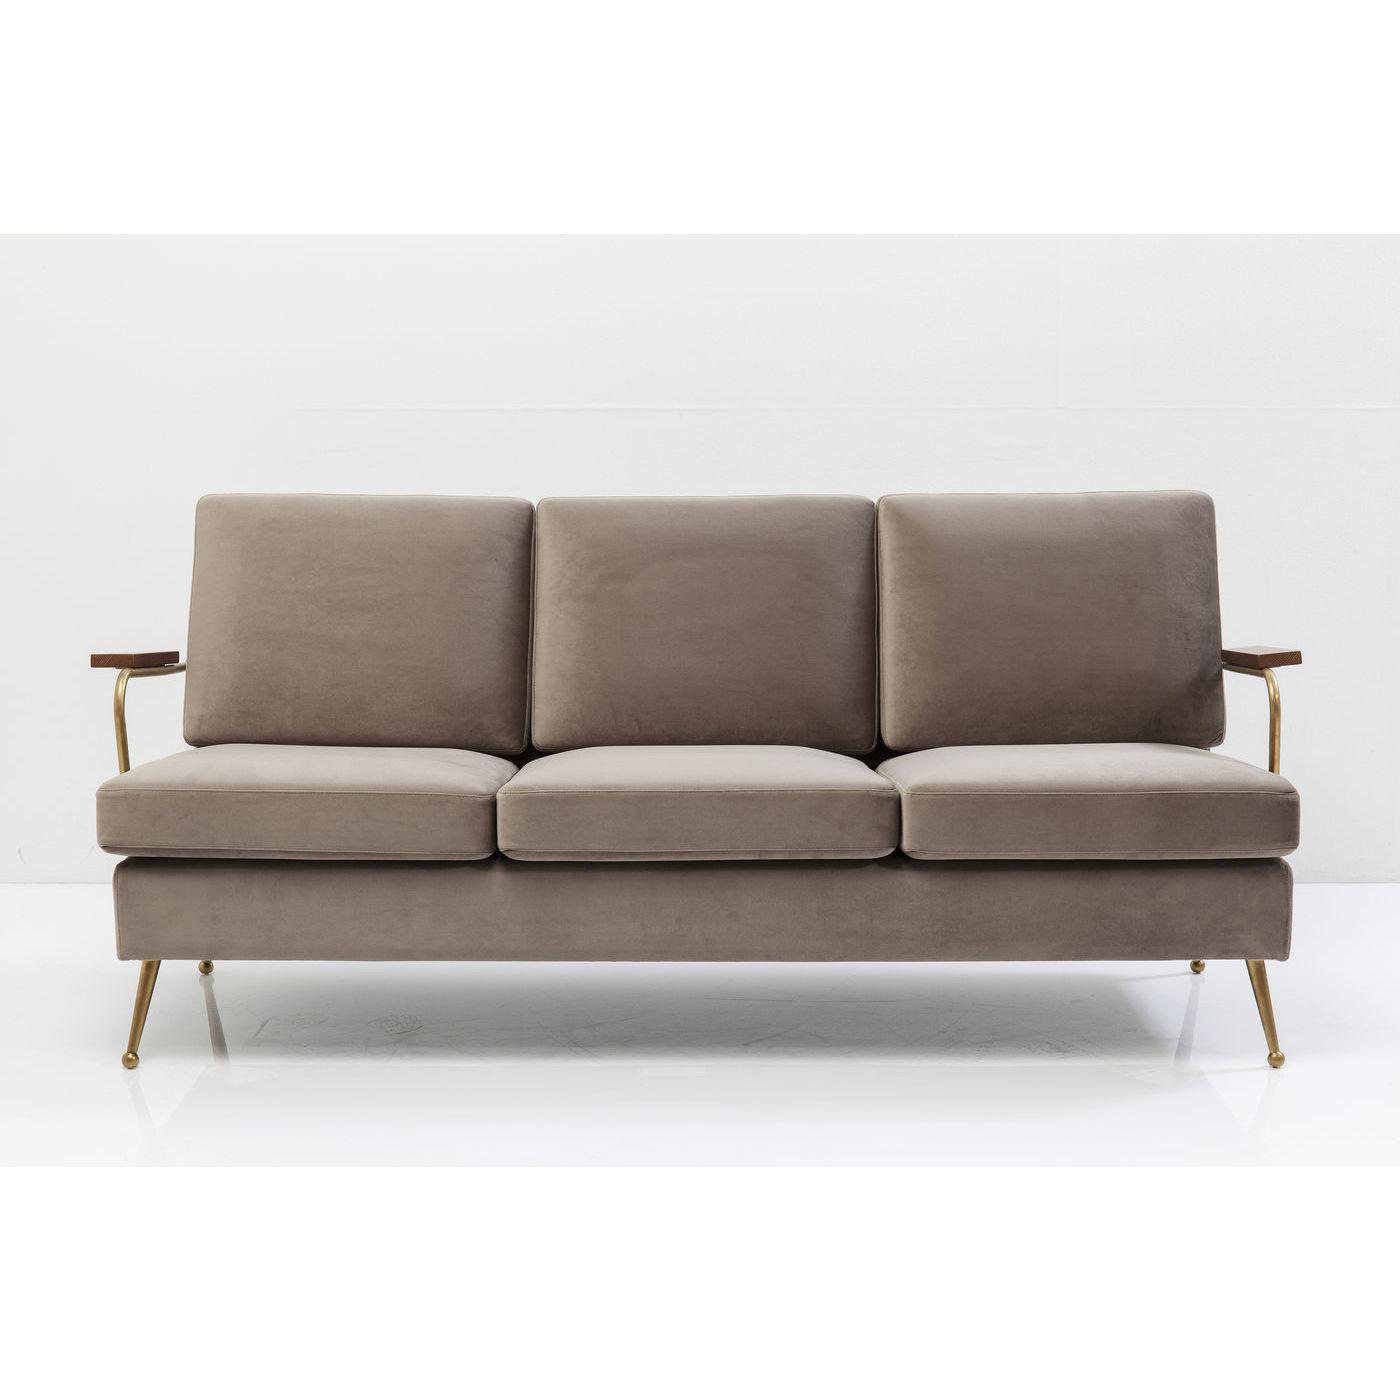 KARE DESIGN Gamble Sand 3-personers sofa - sand stof/messing stl, m. armln